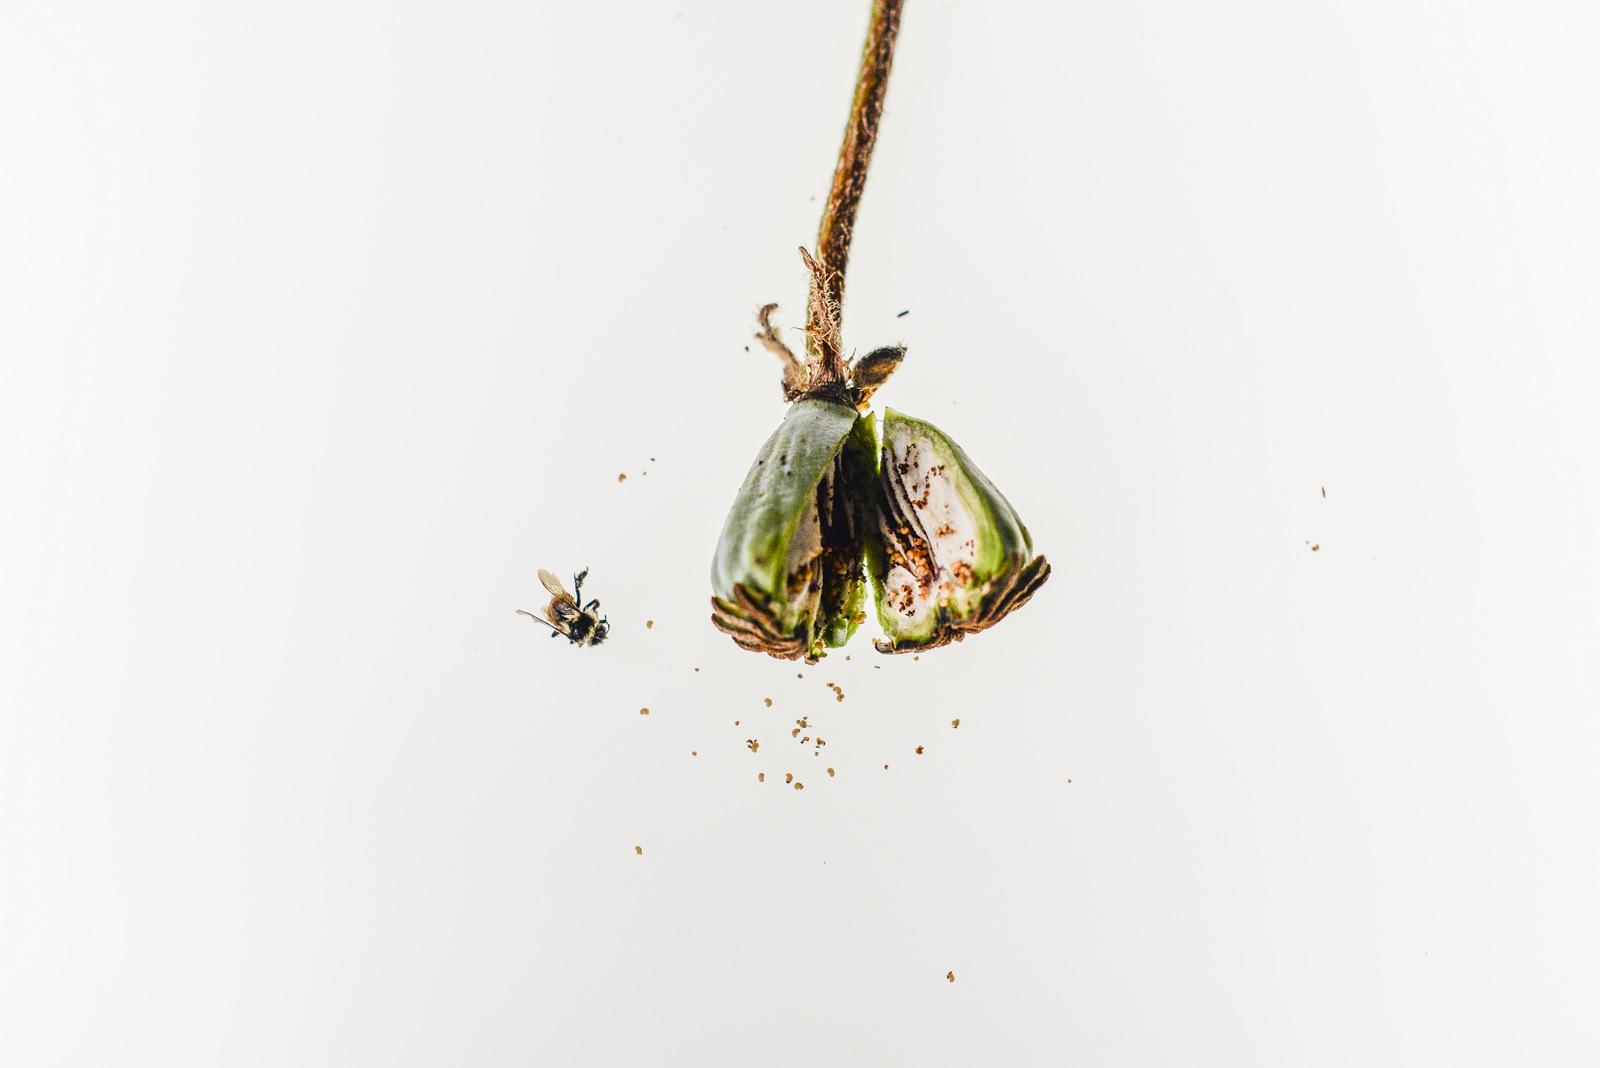 poppy pod split open